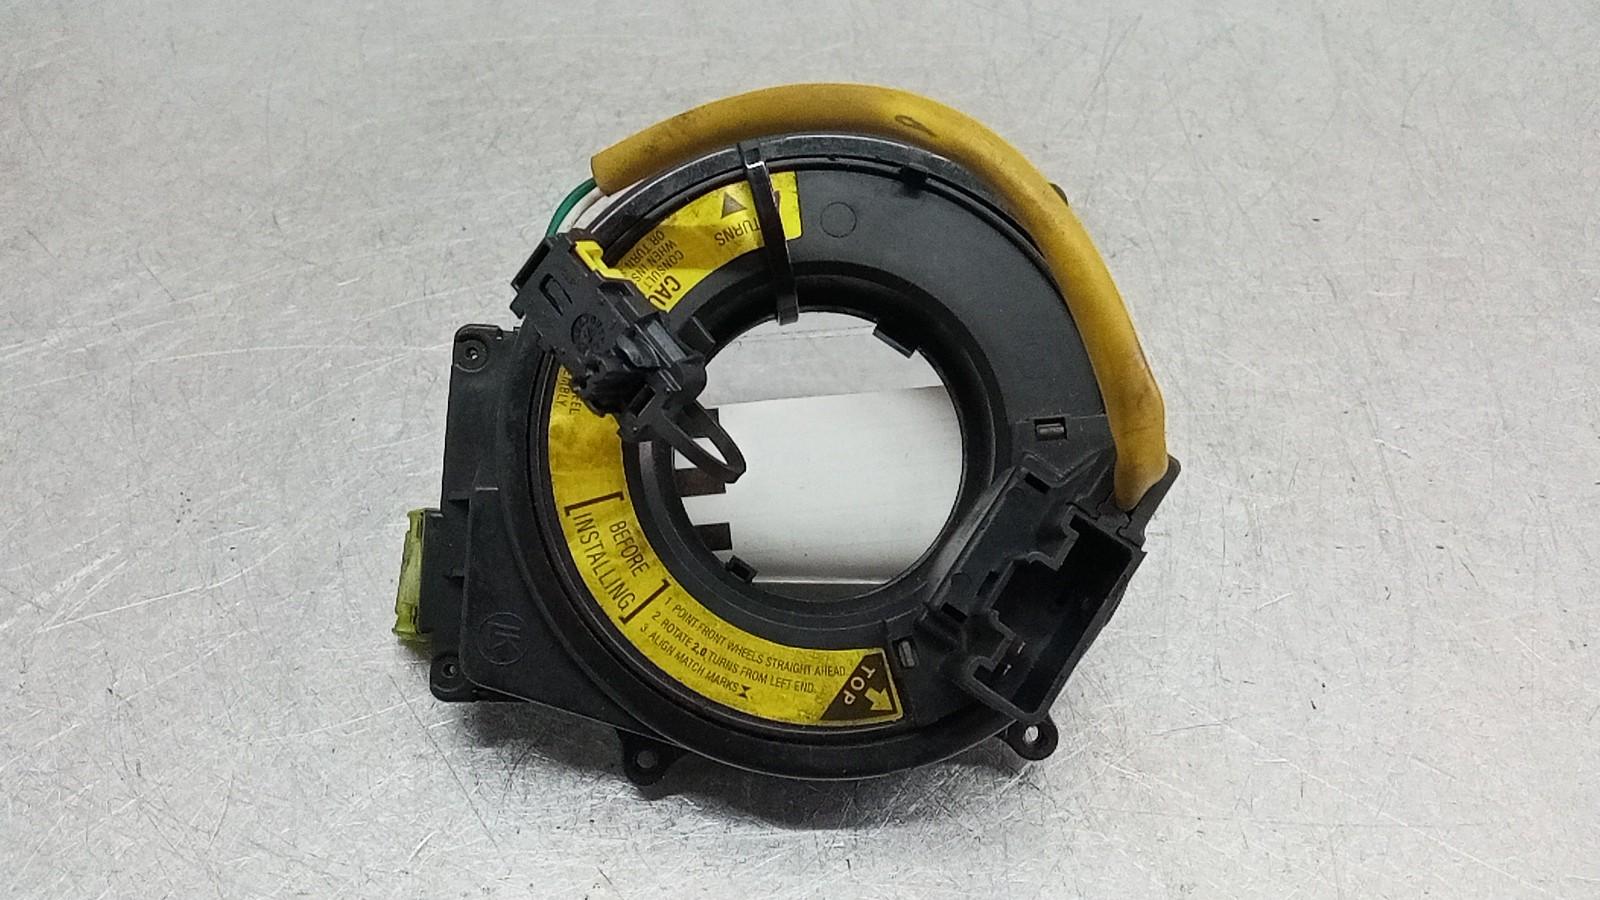 Fita Airbag (20403456).